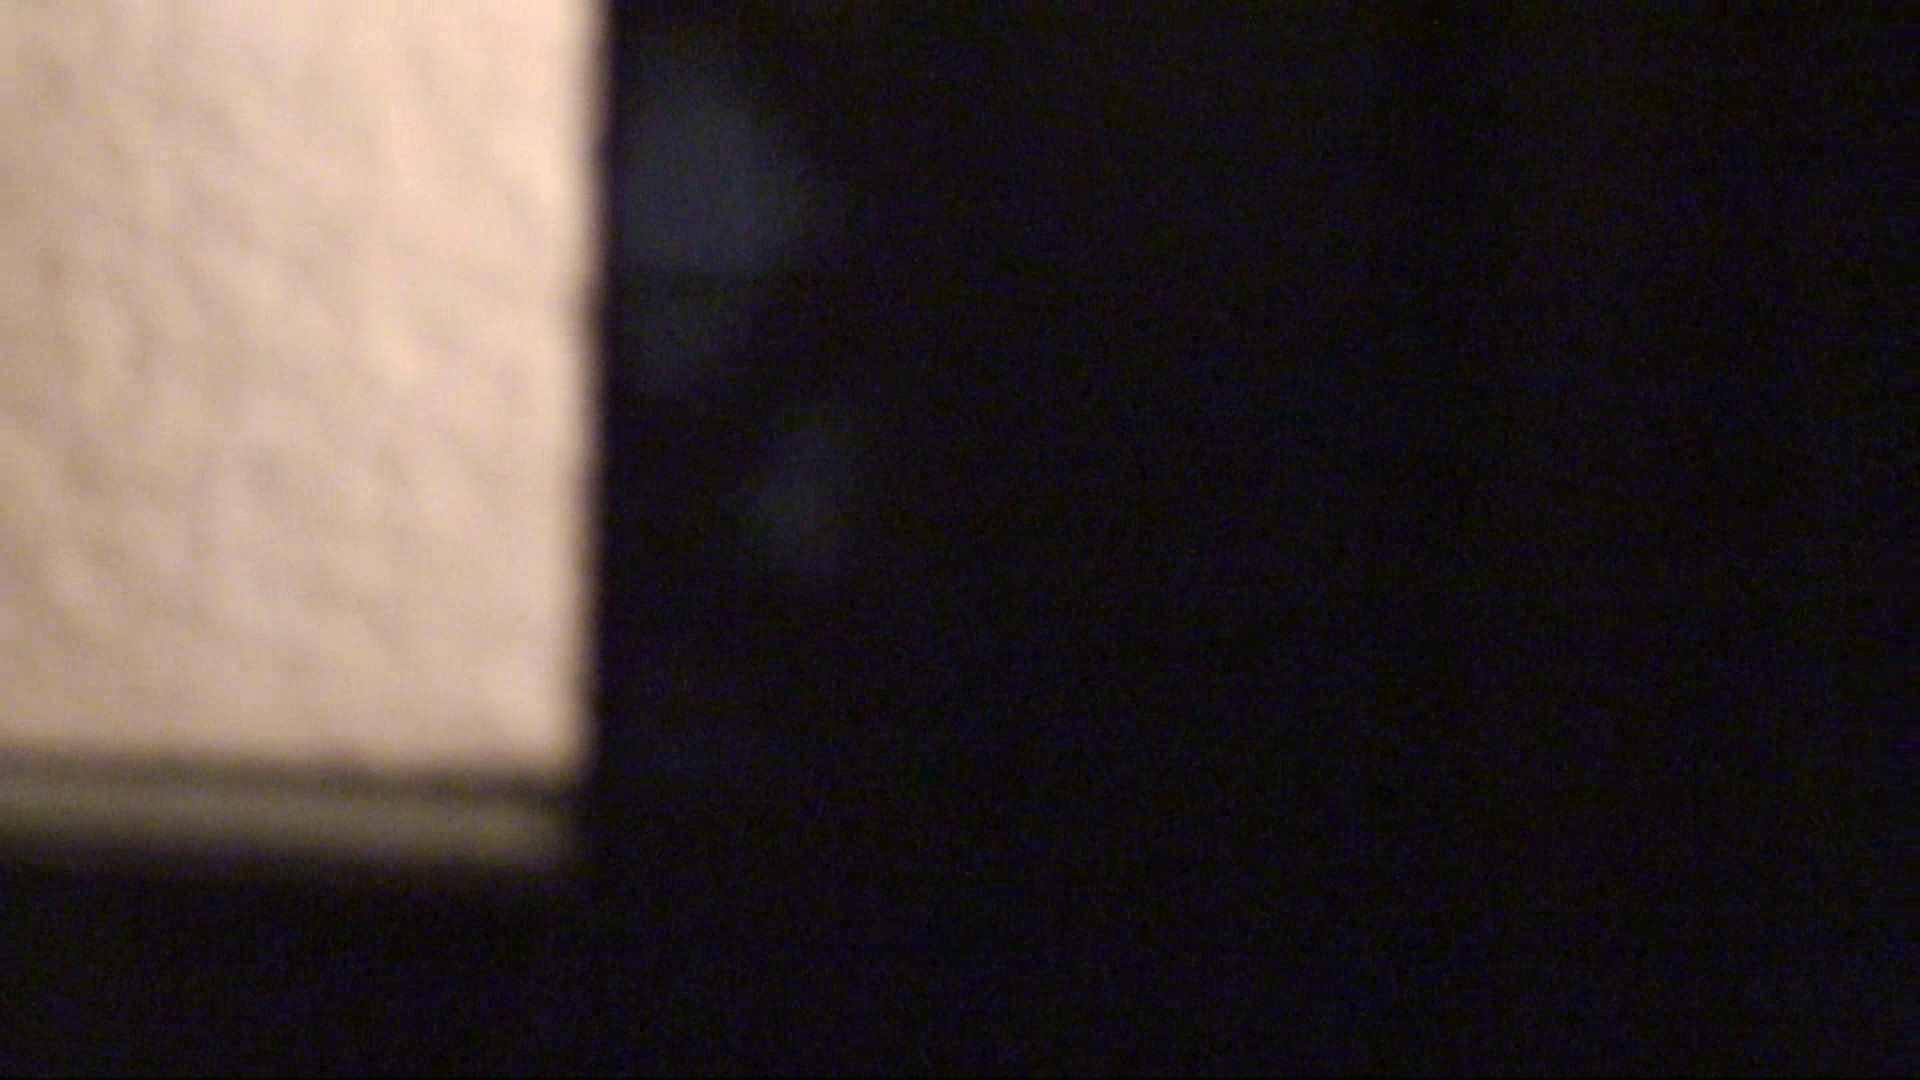 vol.01必見!白肌嬢の乳首が丸見え。極上美人のすっぴん顔をハイビジョンで! 覗き 性交動画流出 71画像 17